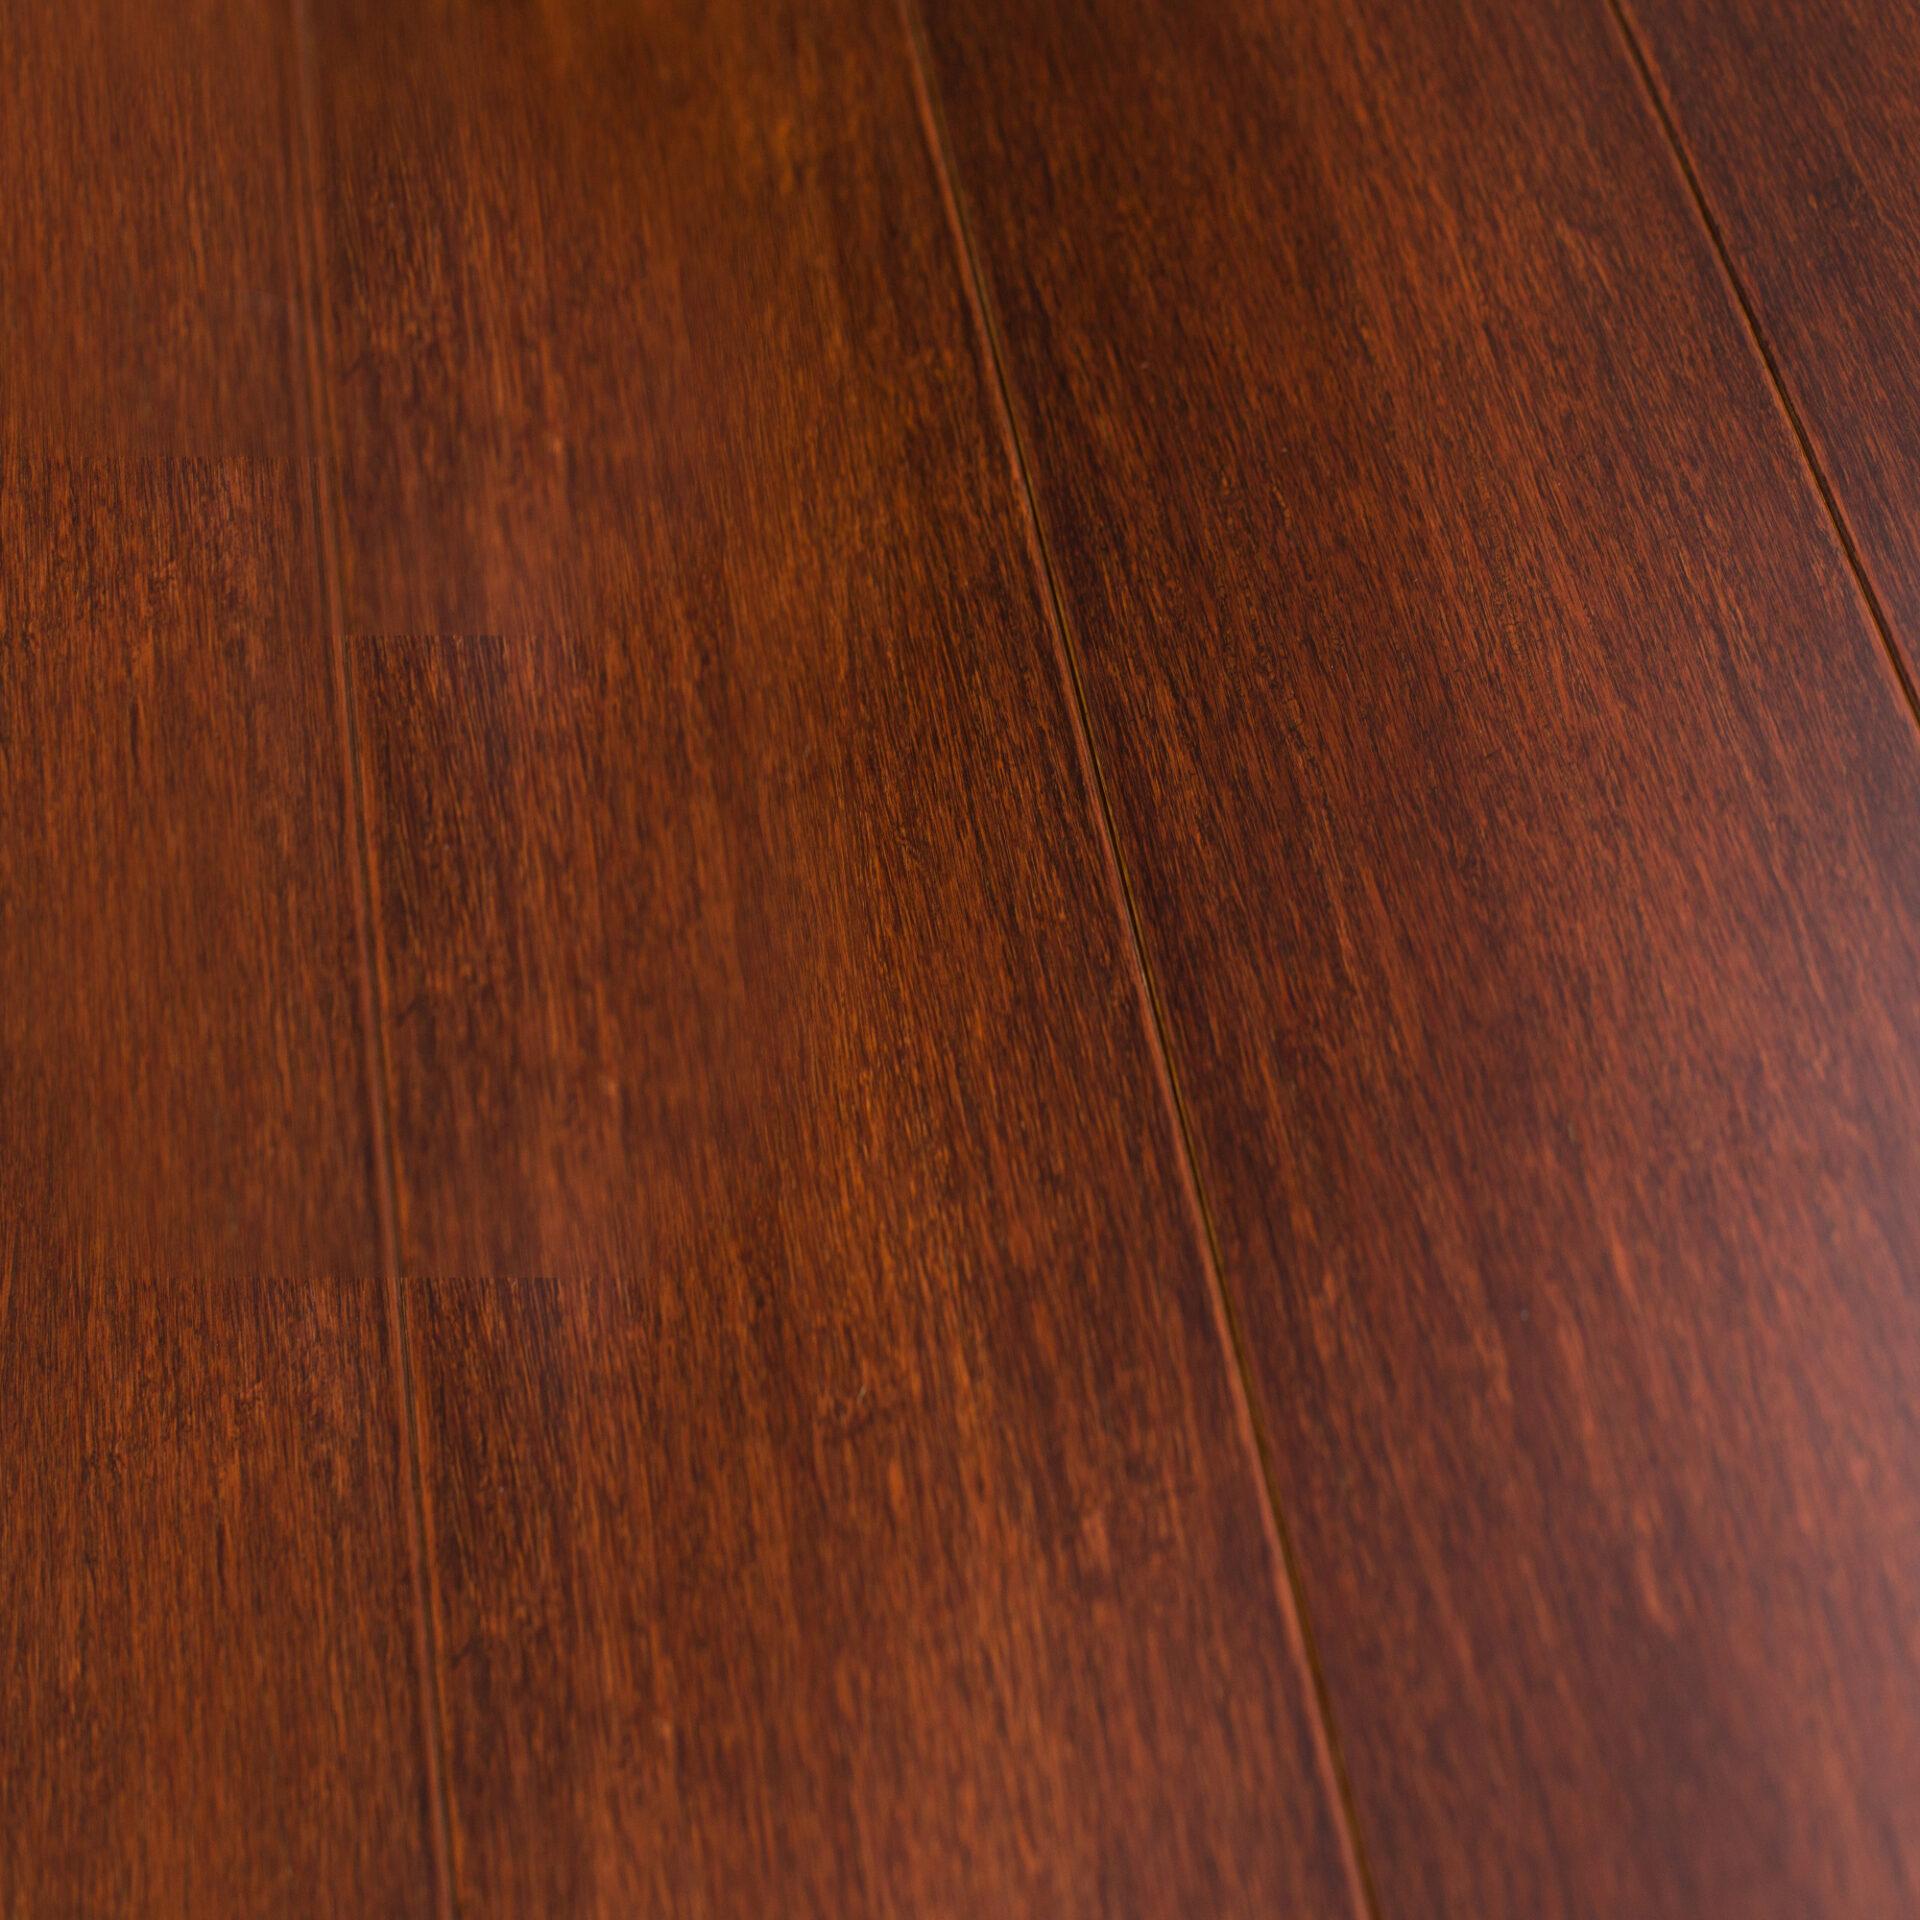 8039: Strand Woven Bamboo Flooring, Merbau Black Walnut: 1530x132x12mm  1